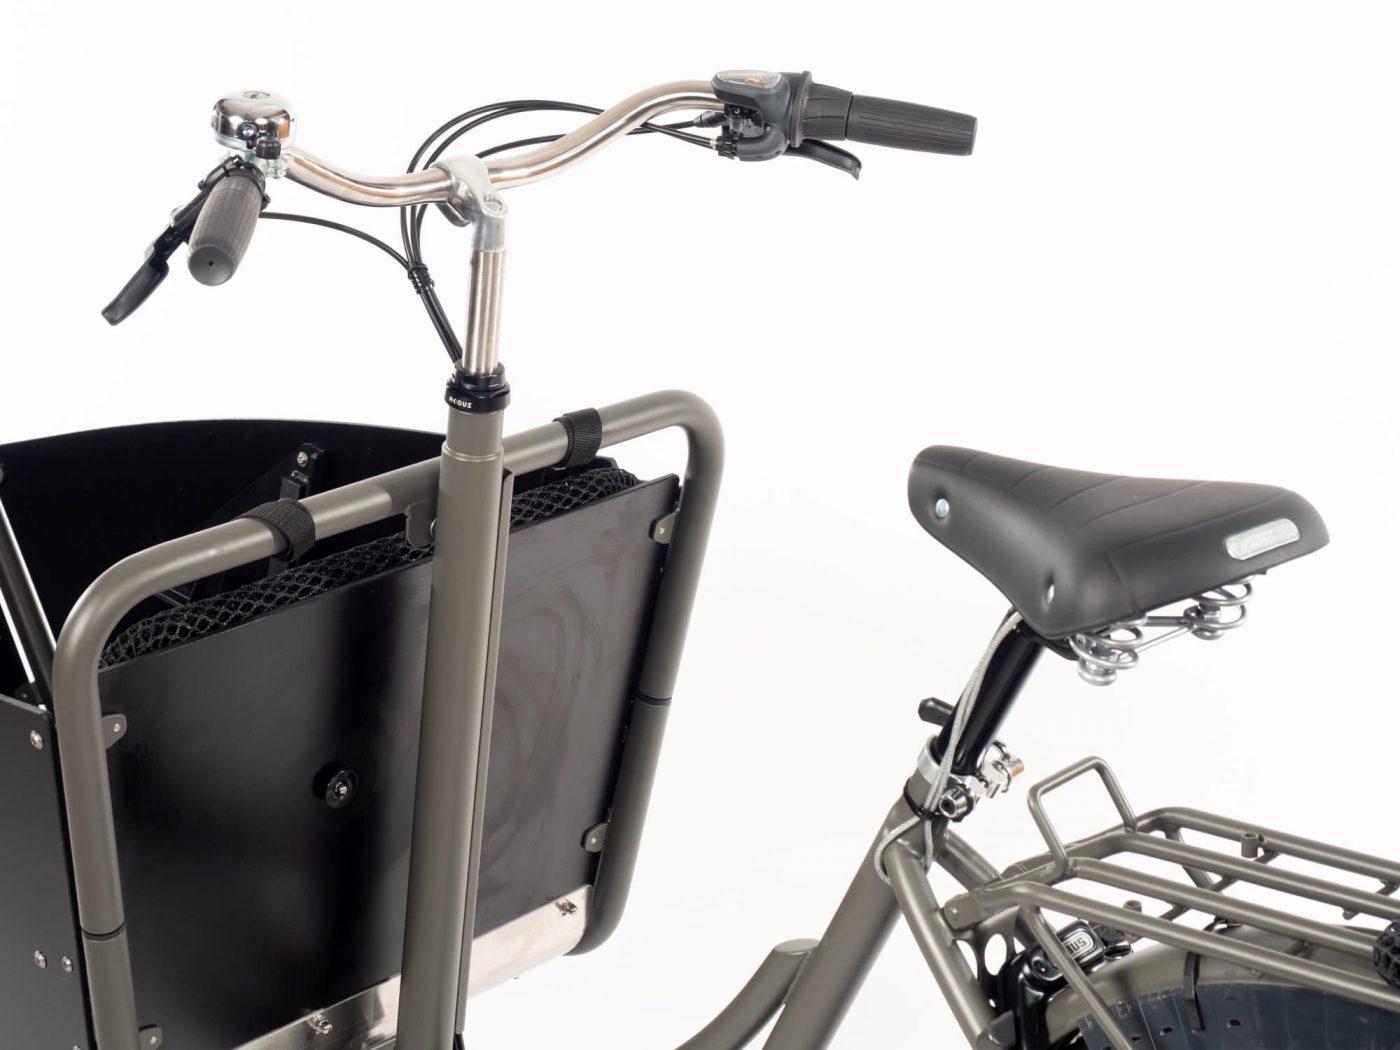 WorkCycles Kr8 bakfiets, child transport bike, dutch city bike, Cockpit options standard